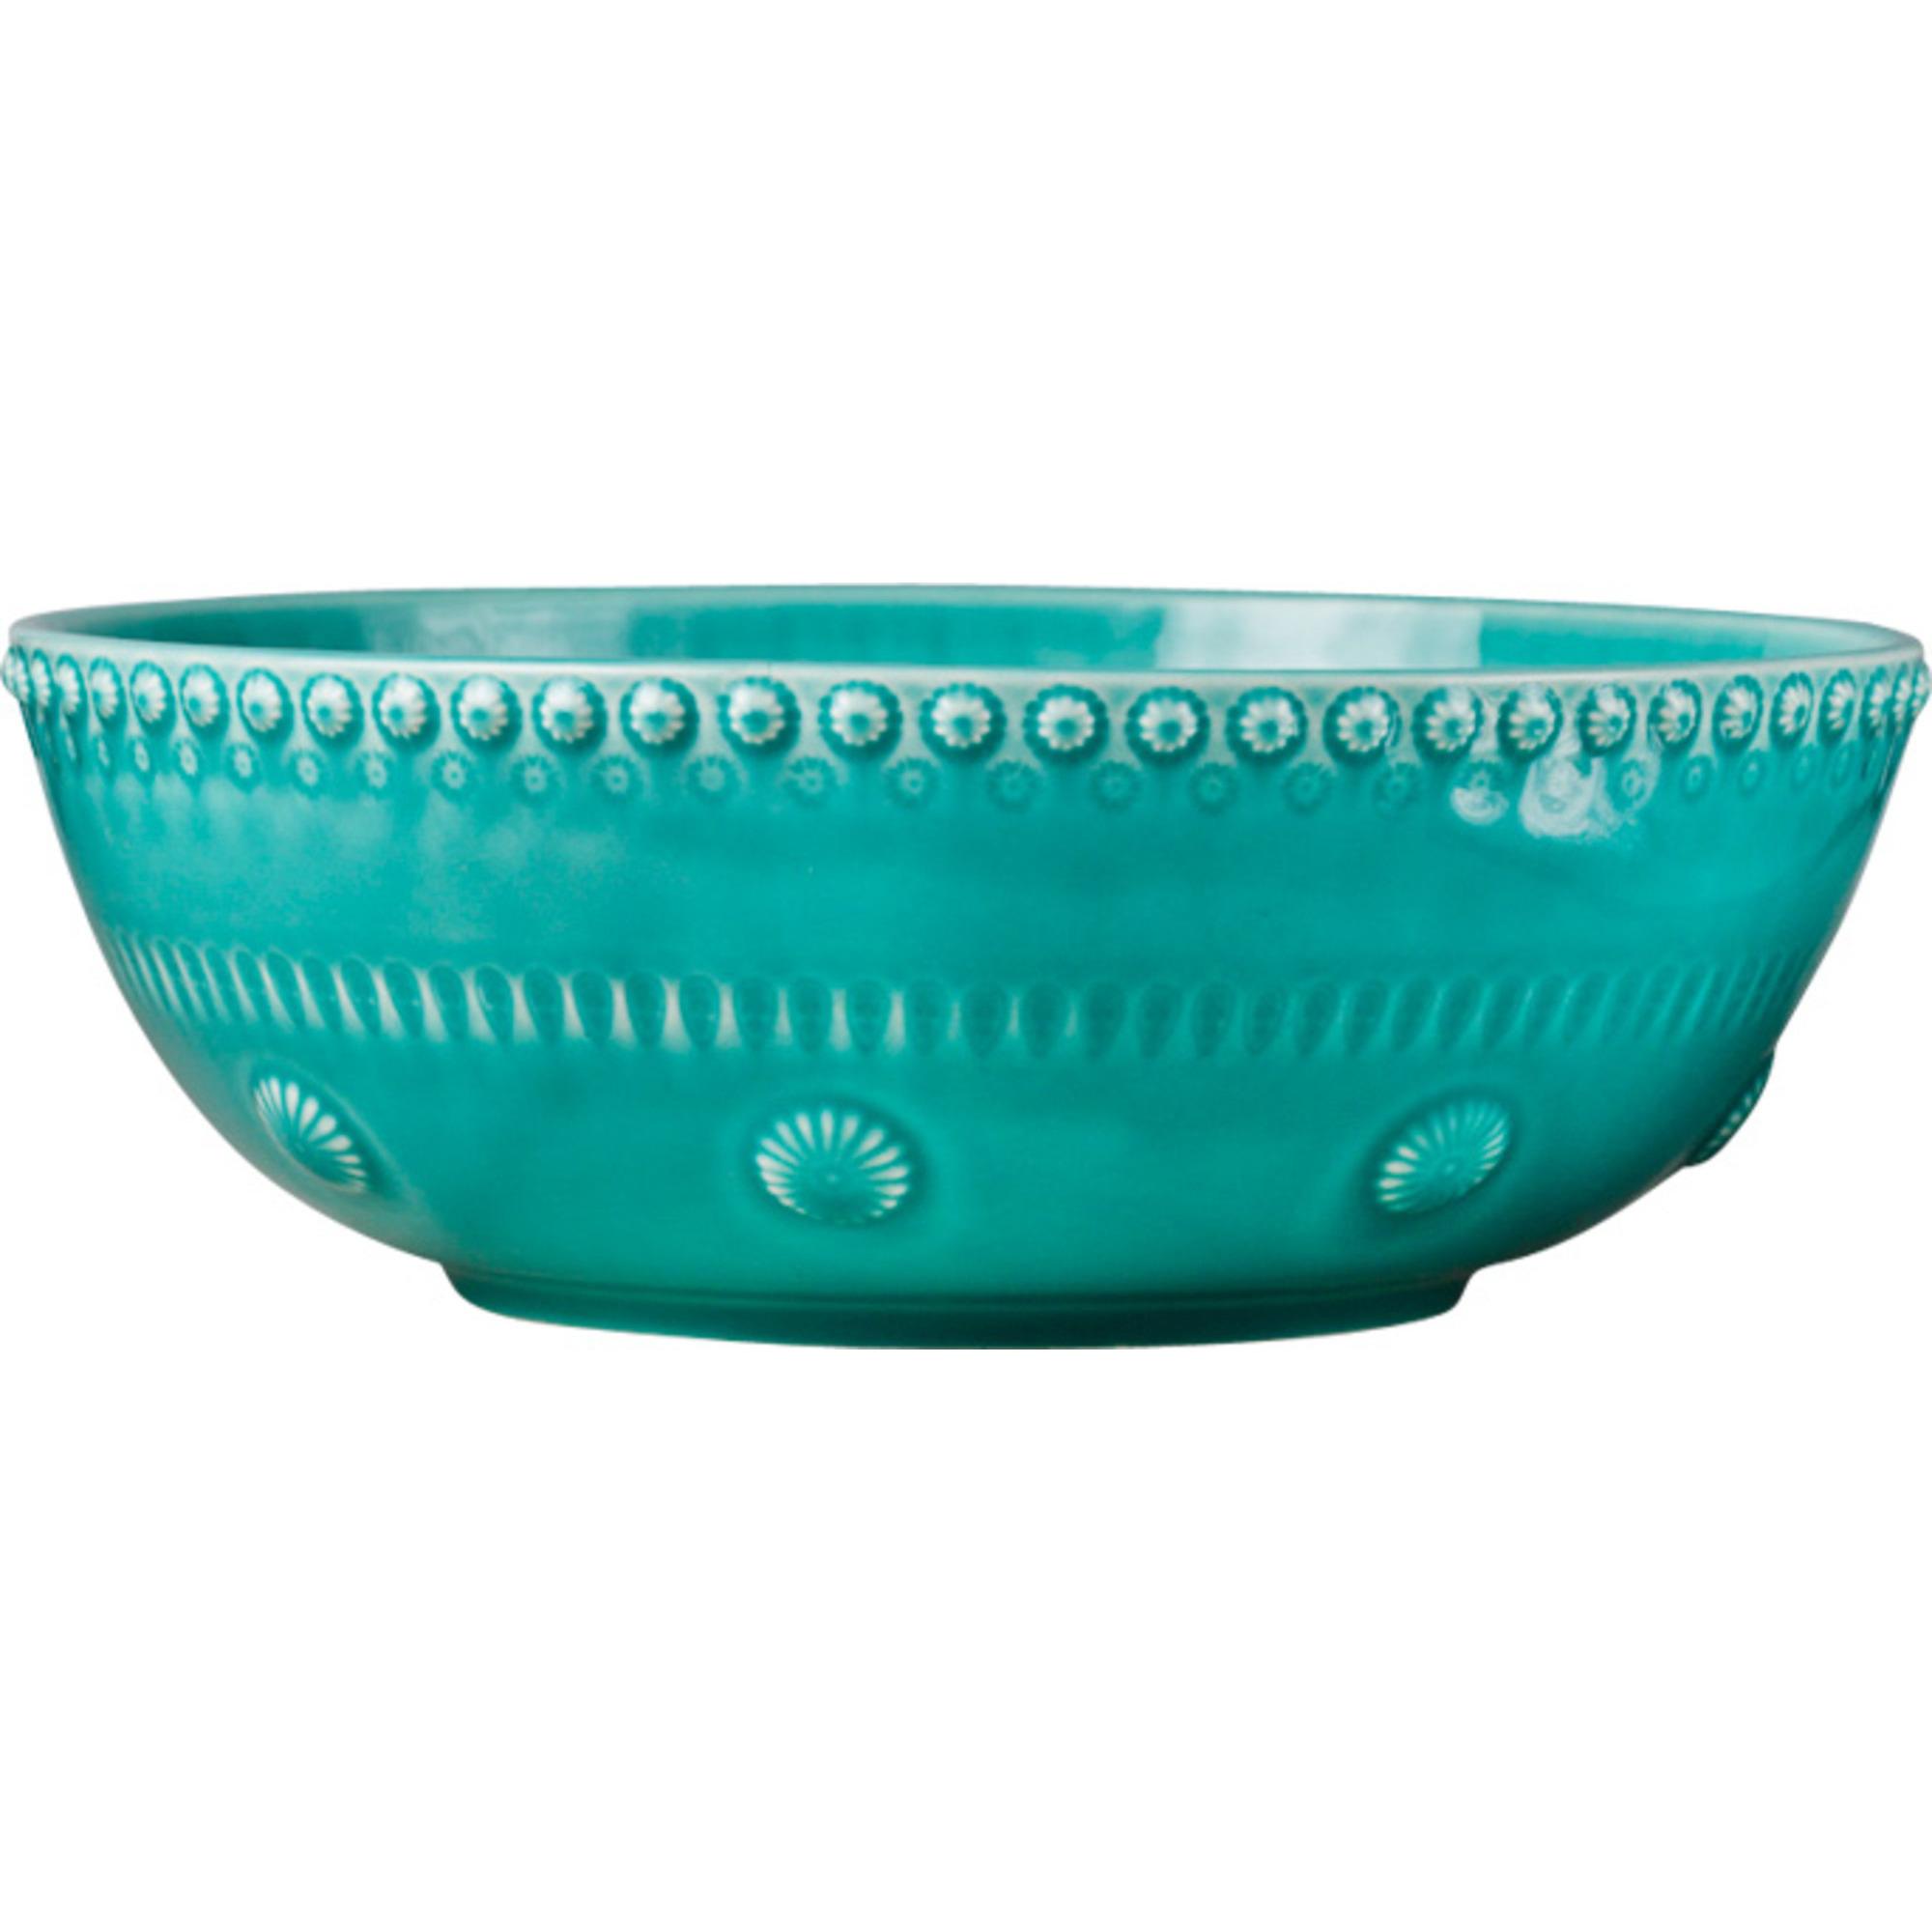 PotteryJo Daisy Salladsskål 30 cm Turquoise